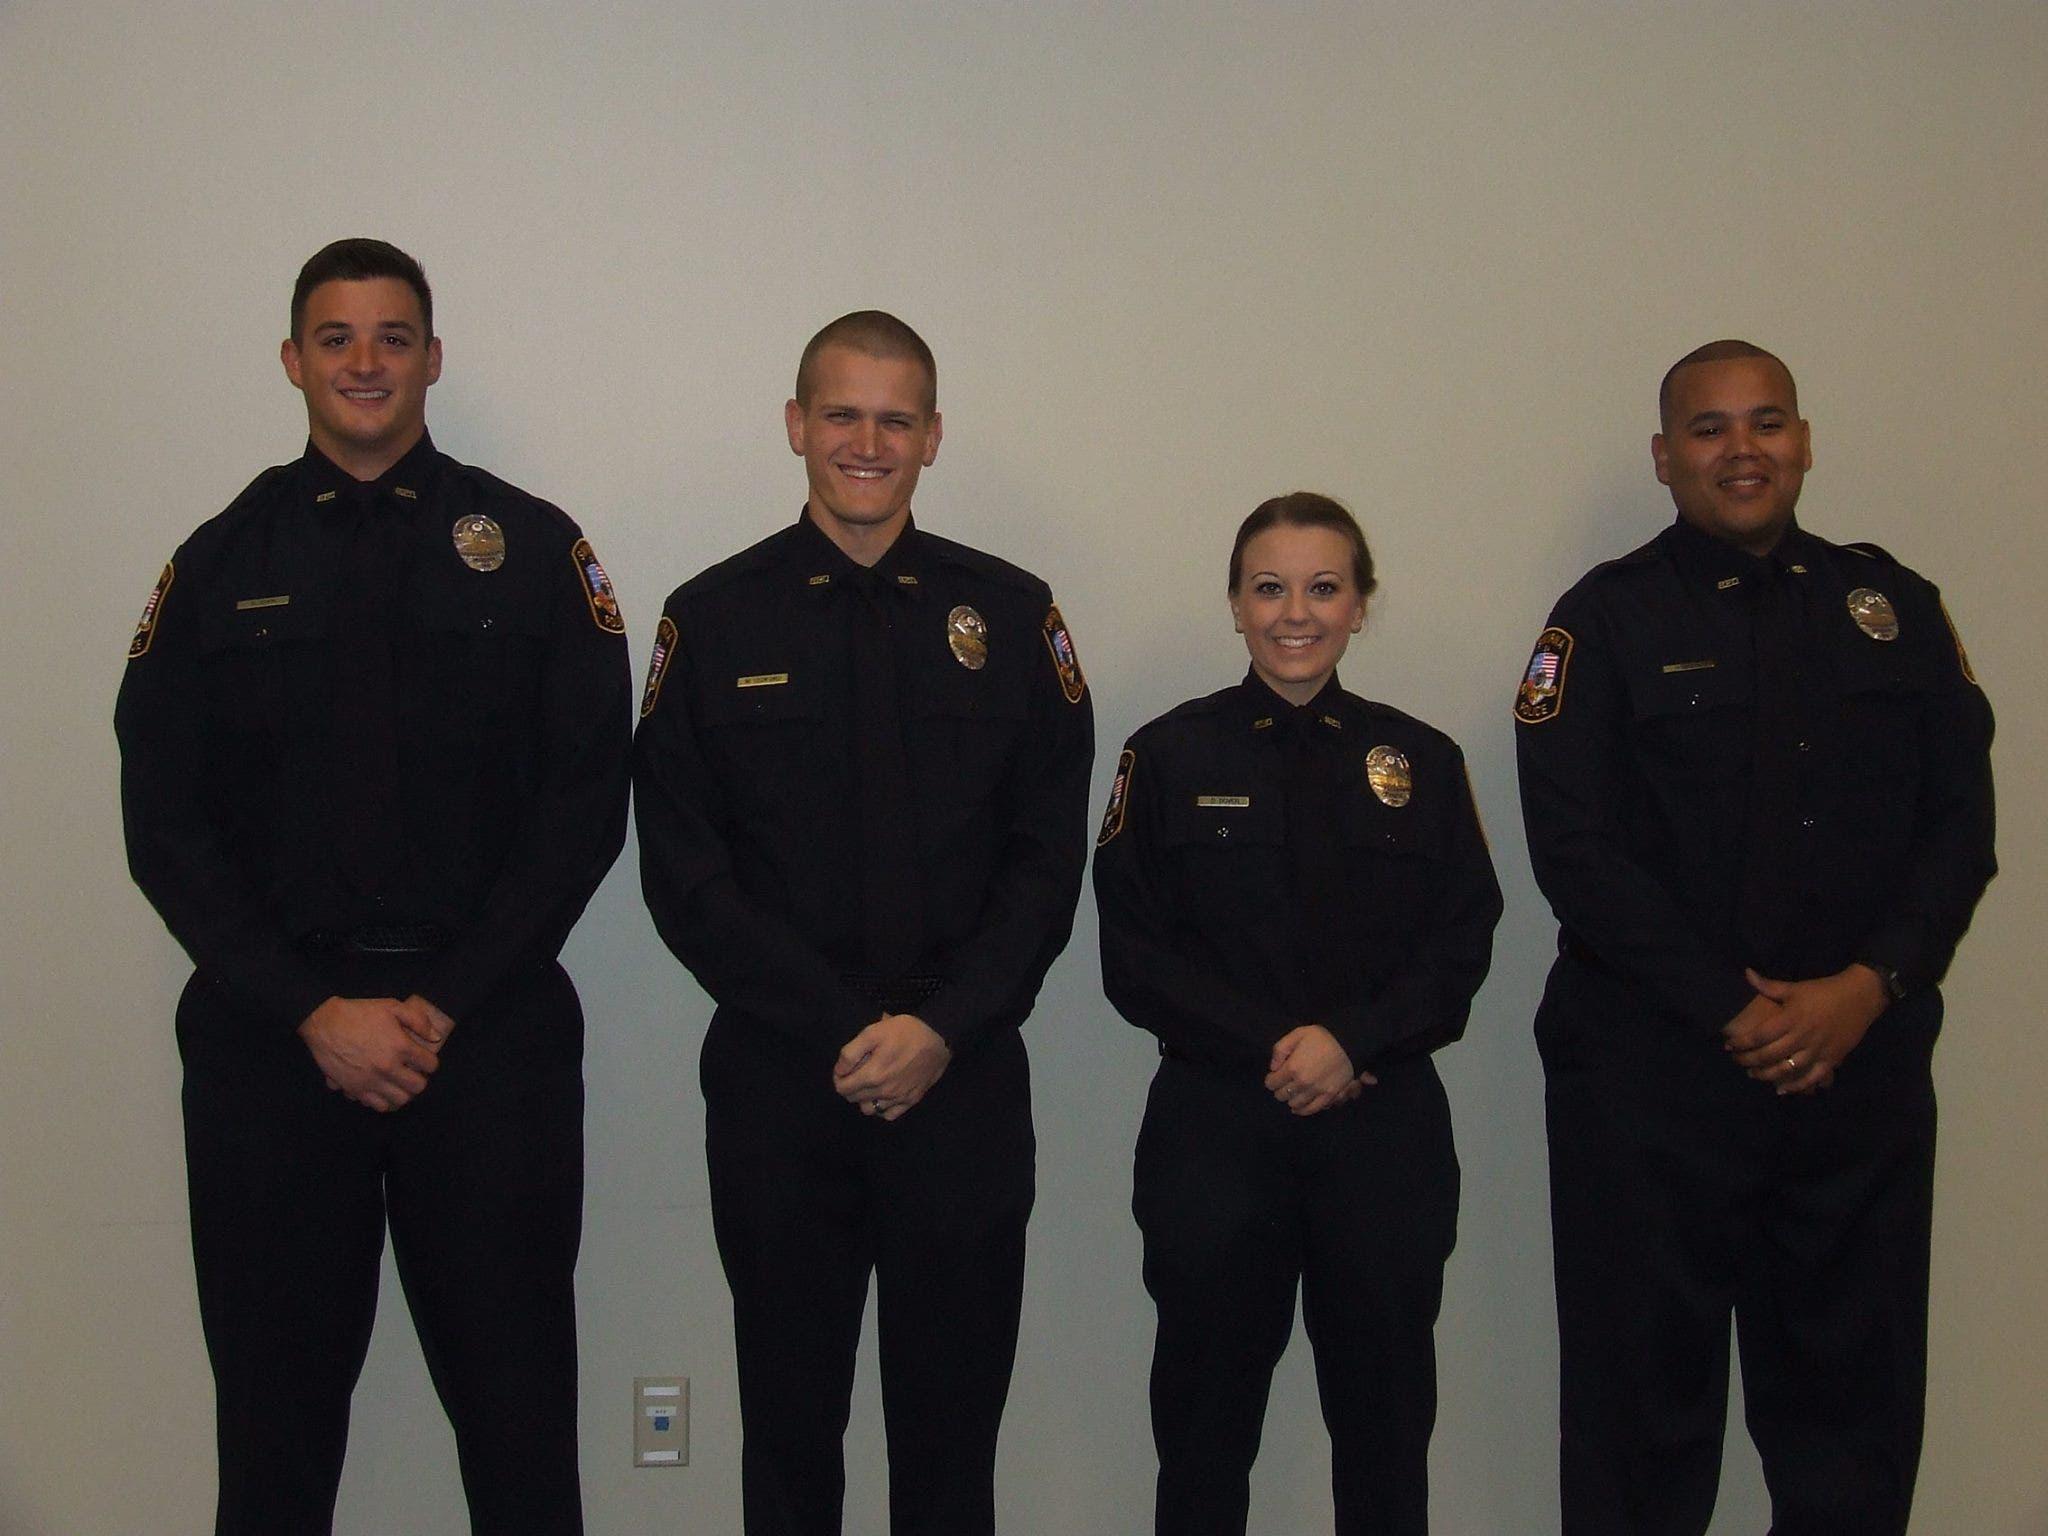 New Officers Join Smyrna Police Department | Smyrna, GA Patch